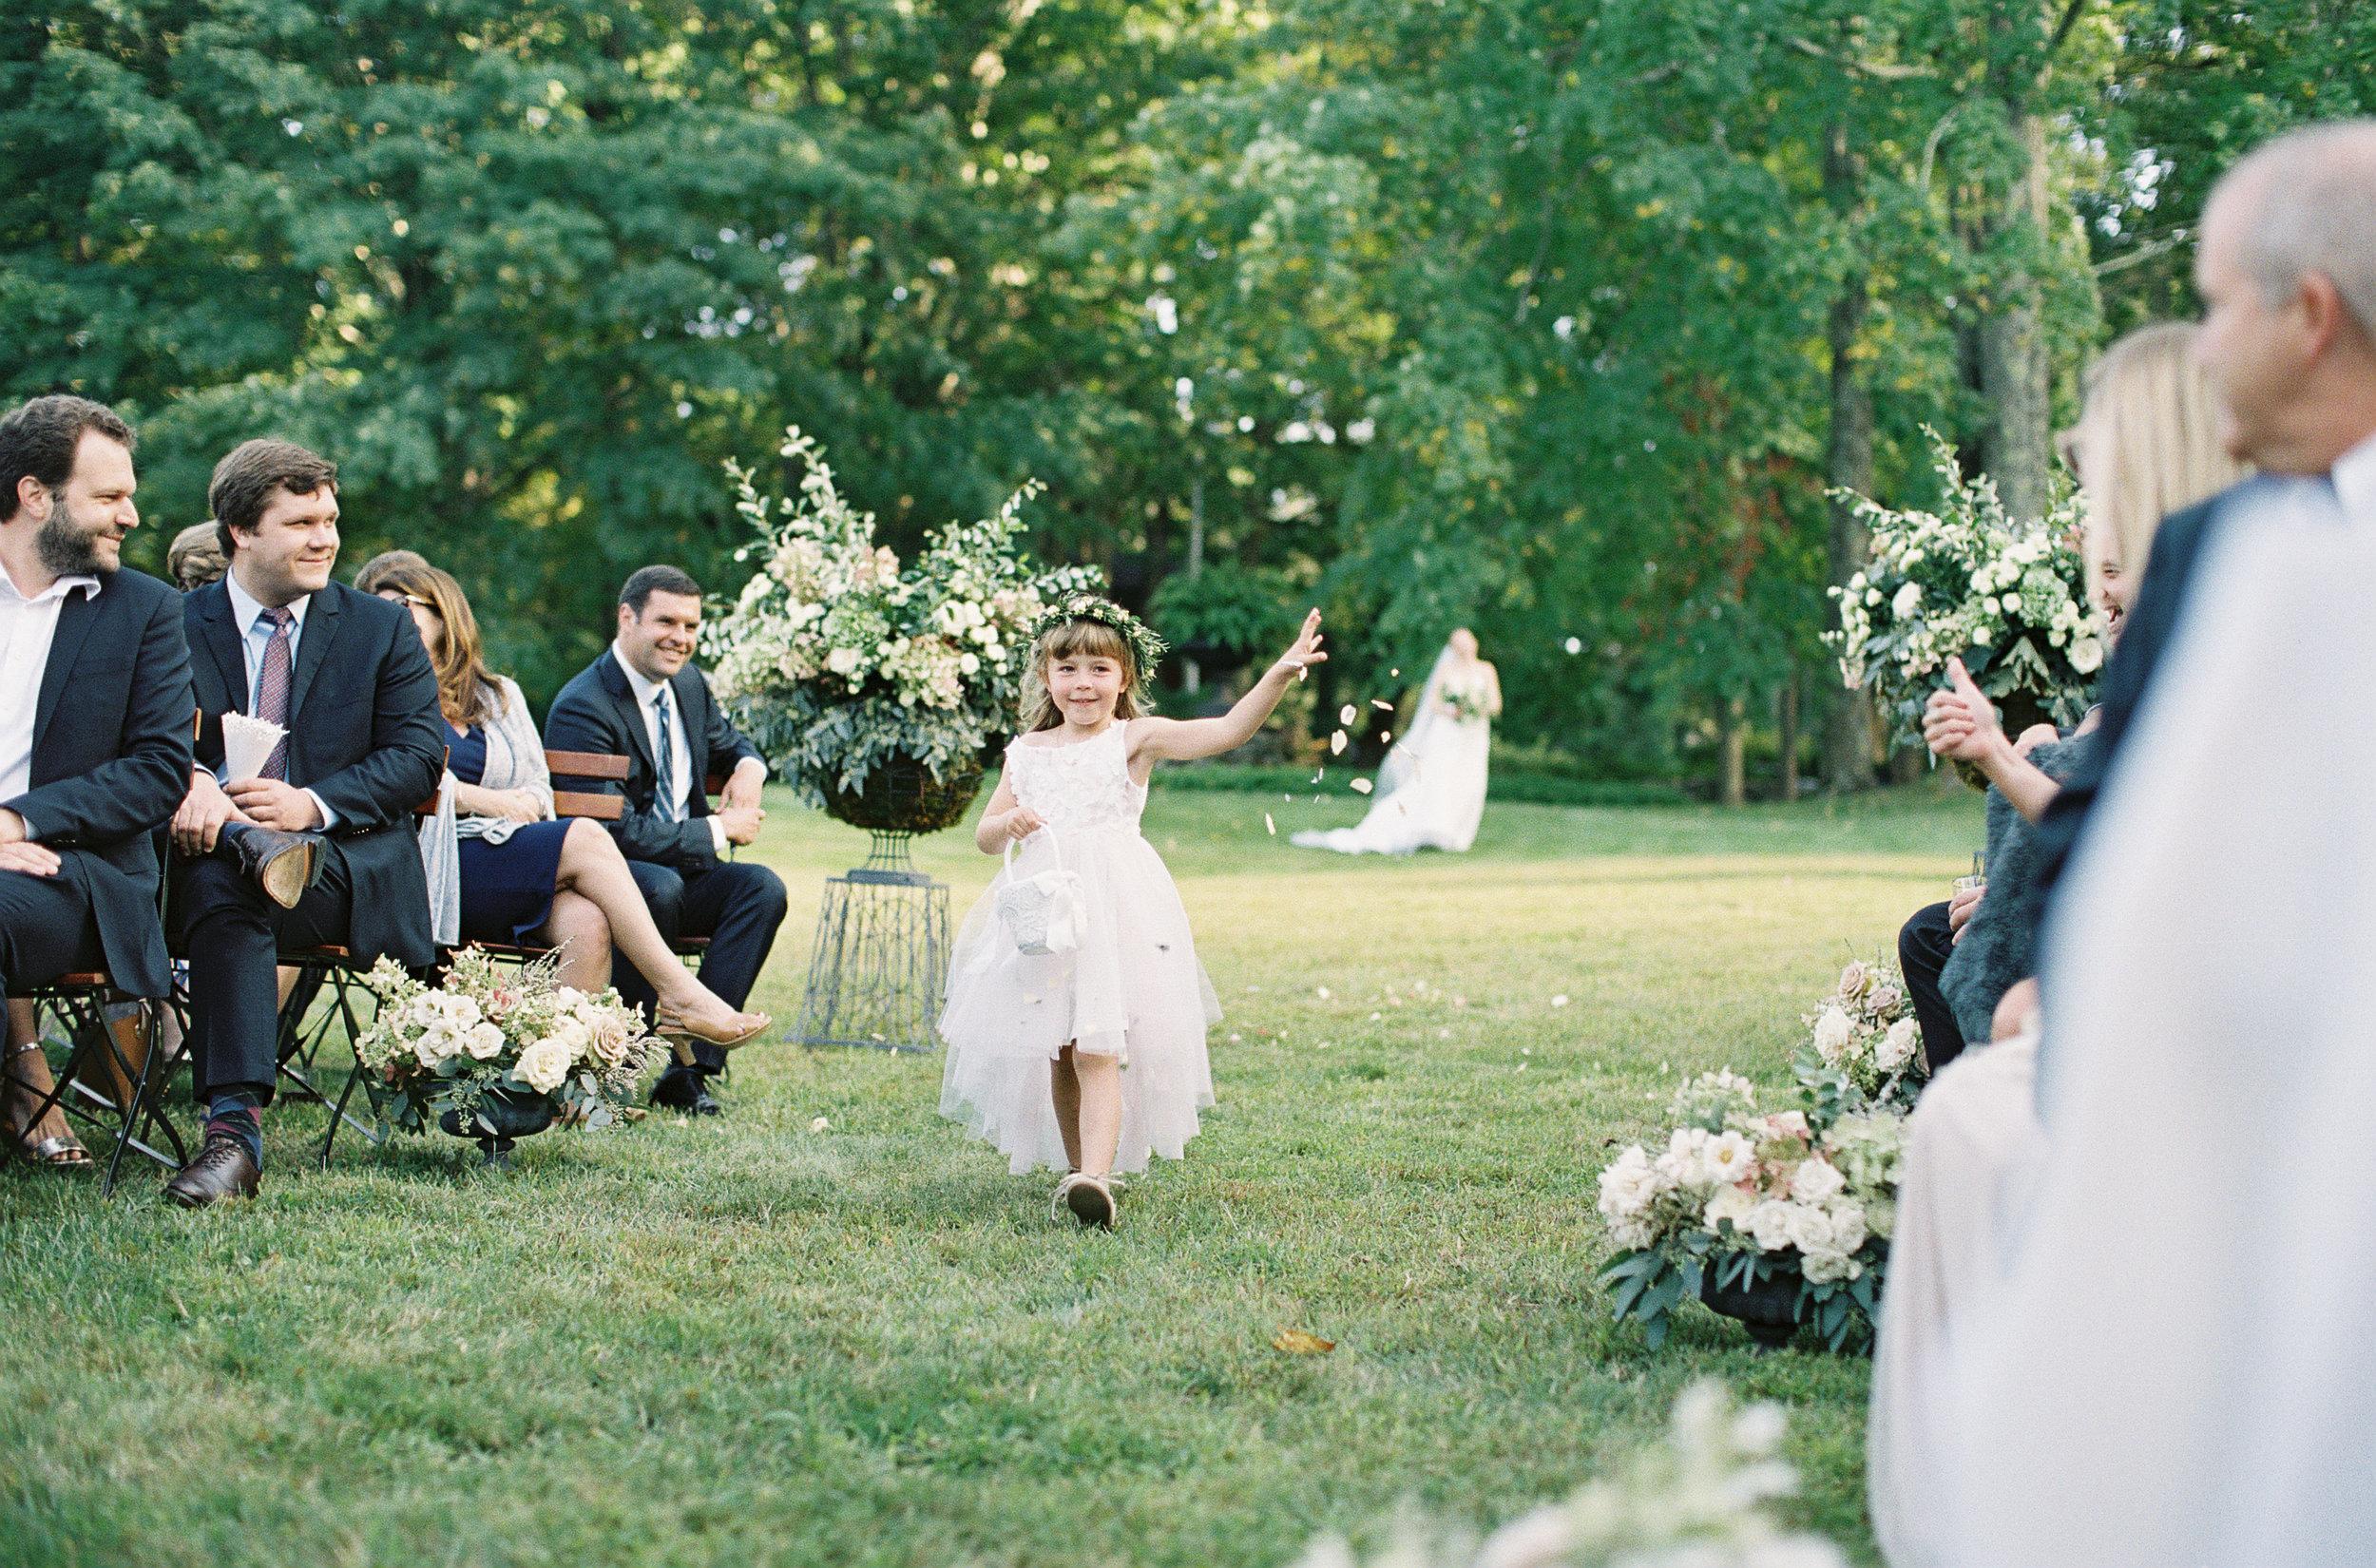 Redding-Connecticut-Wedding-38.jpg